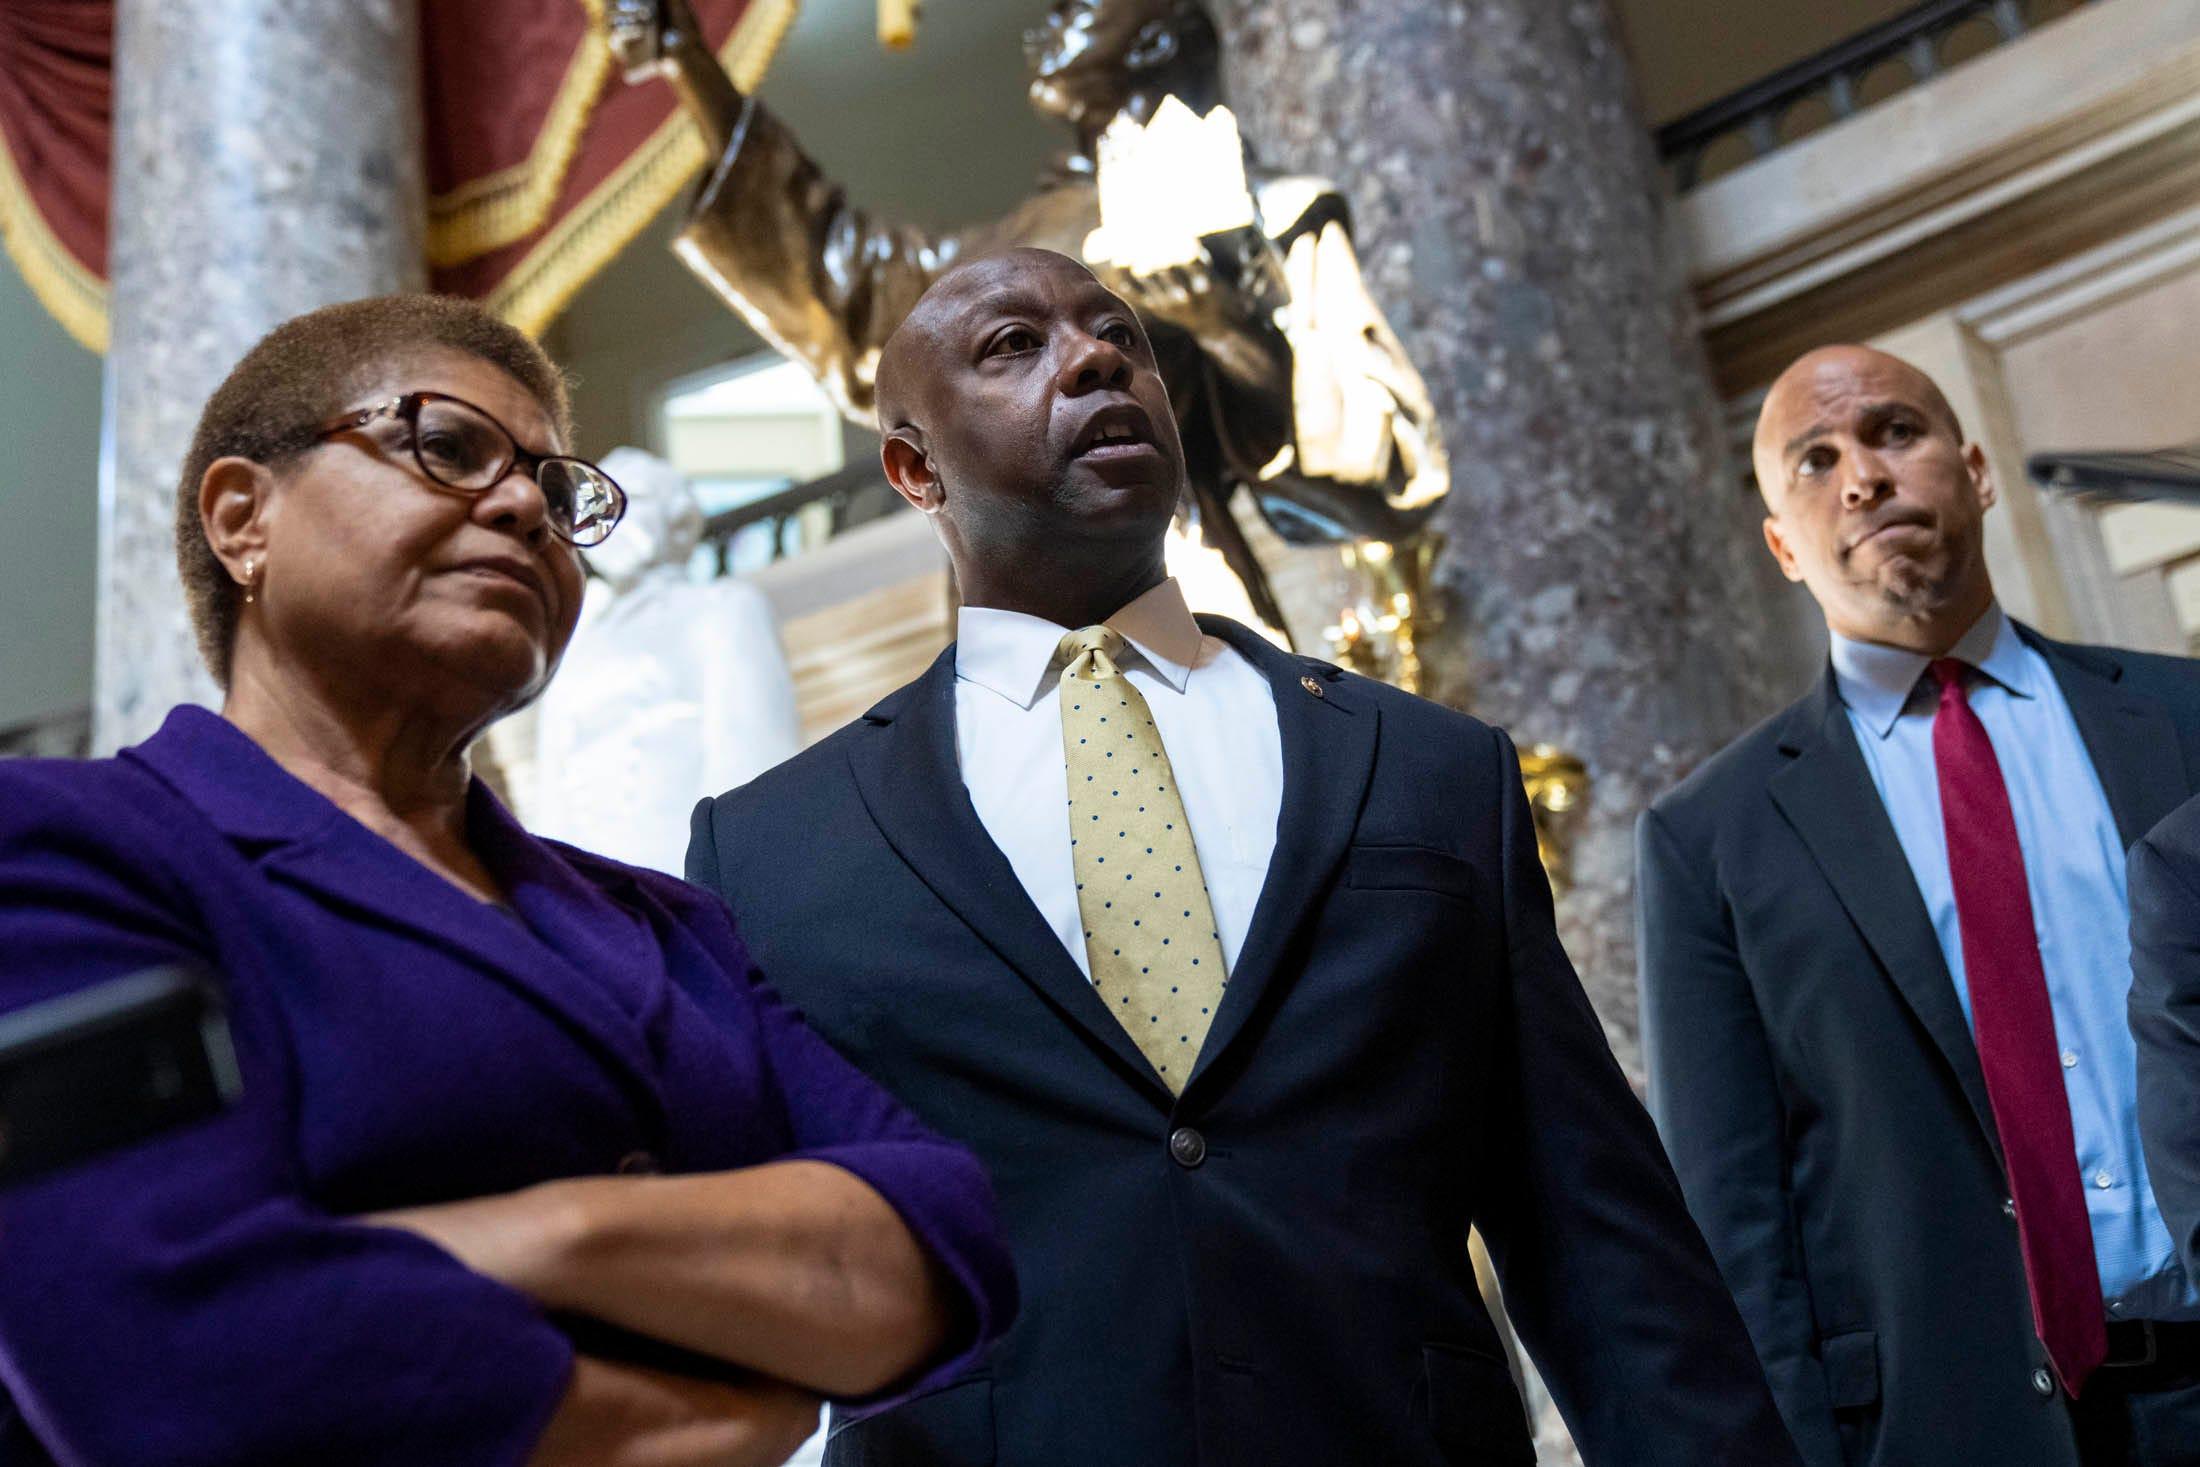 Rep. Karen Bass, D-Calif., Sen. Tim Scott, R-S.C., and Sen. Cory Booker, D-N.J., are leading negotiations on police reform legislation on Capitol Hill.